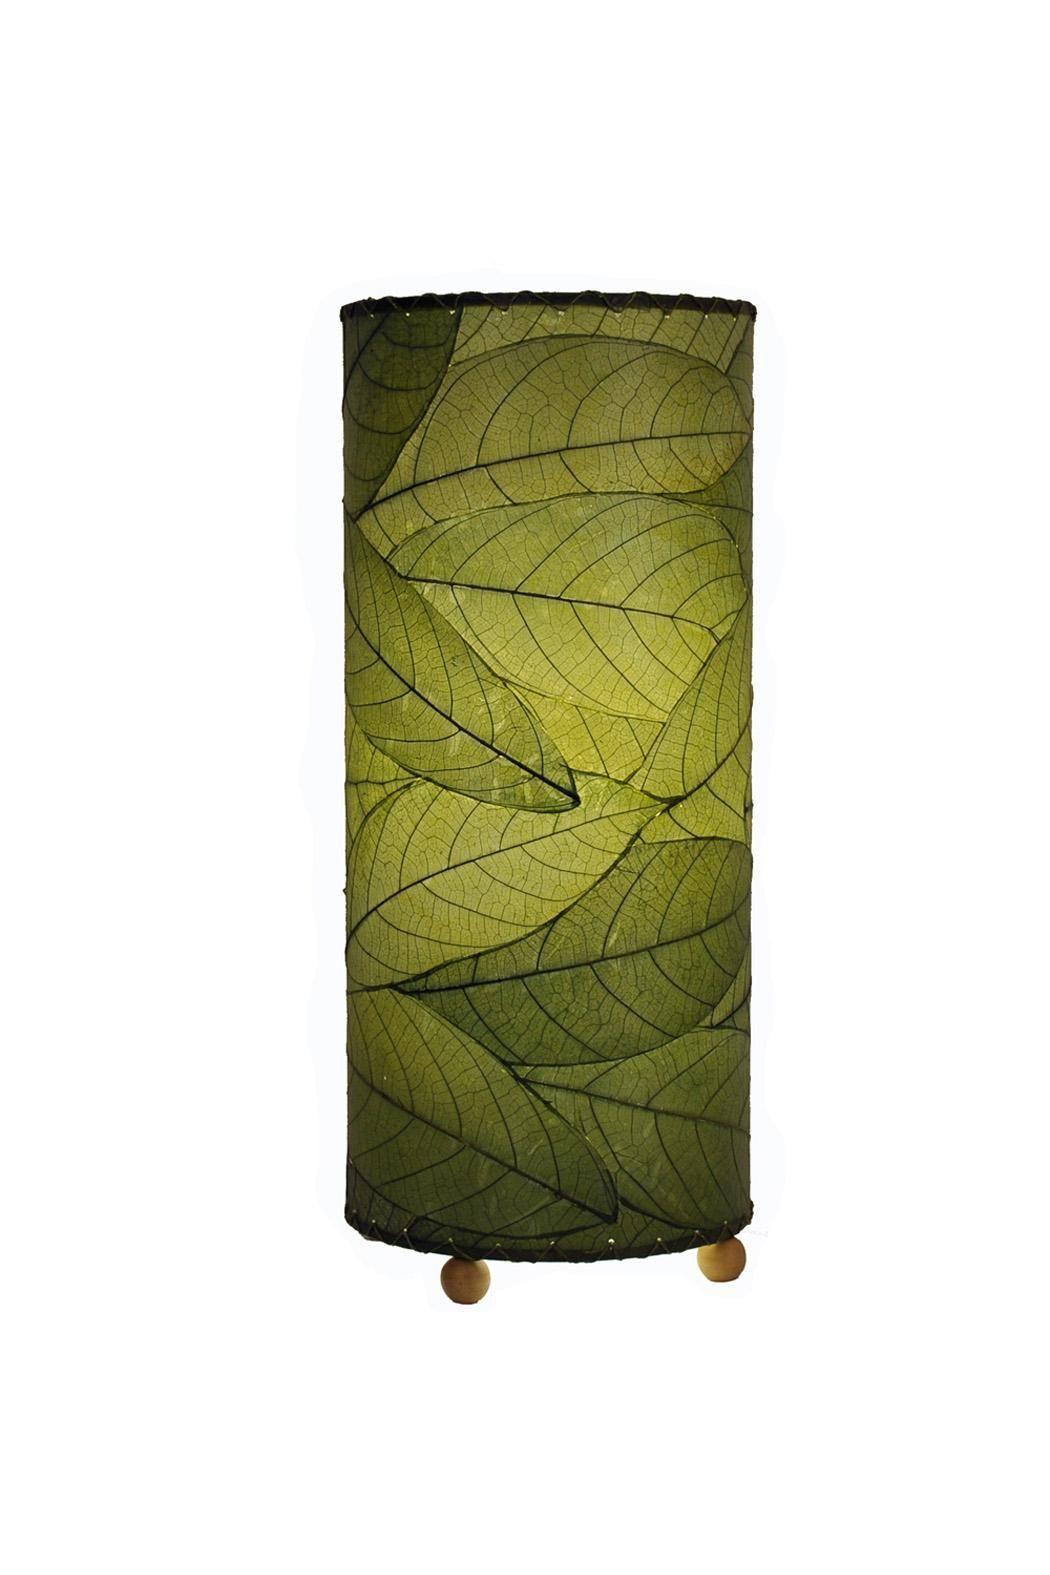 Cocoa Leaf Lamp Table Lamp Shades Table Lamp Lamp